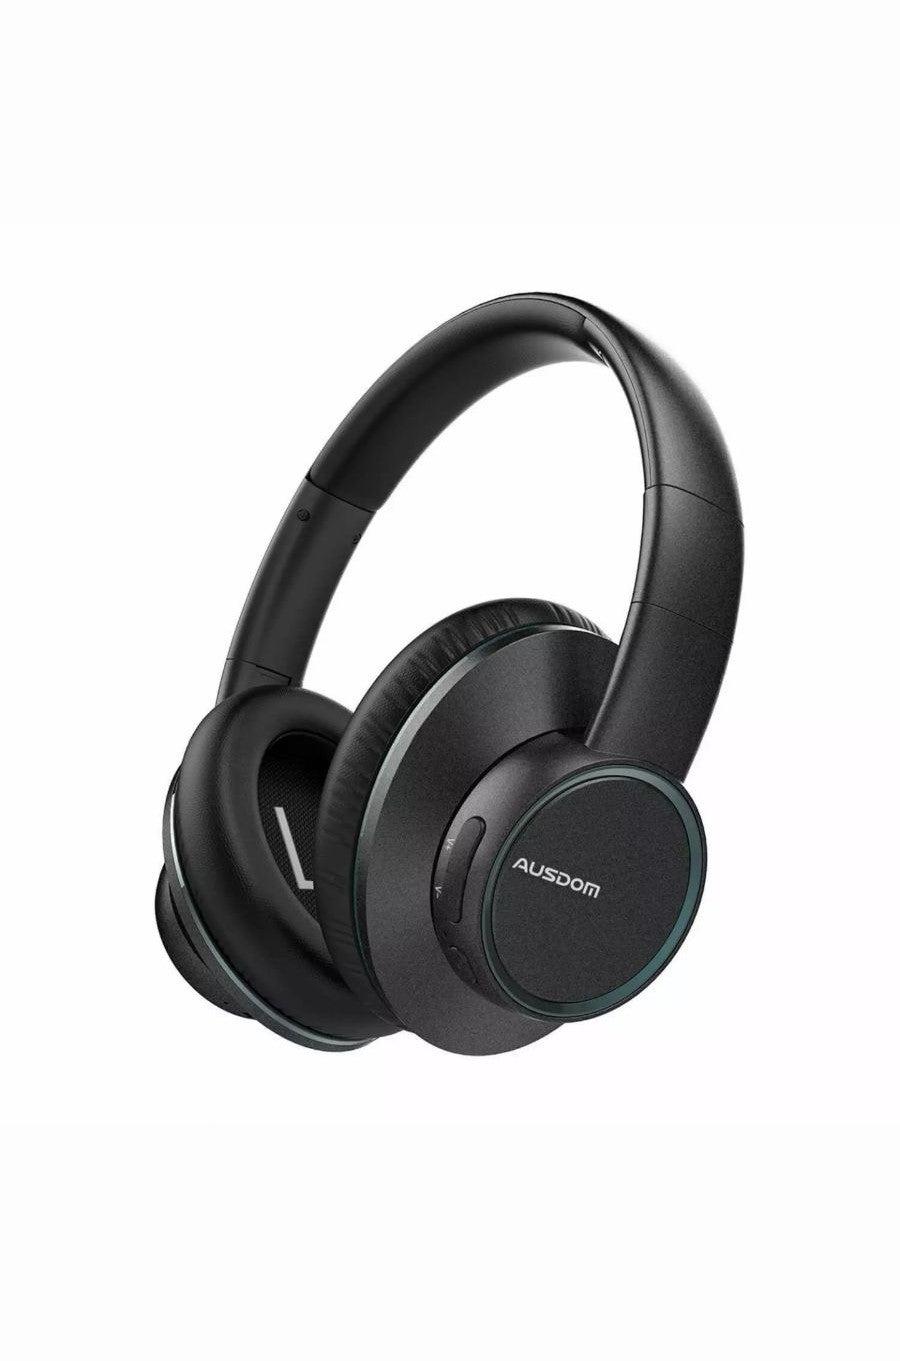 NEW! AUSDOM H8 Wireless Gaming Headset